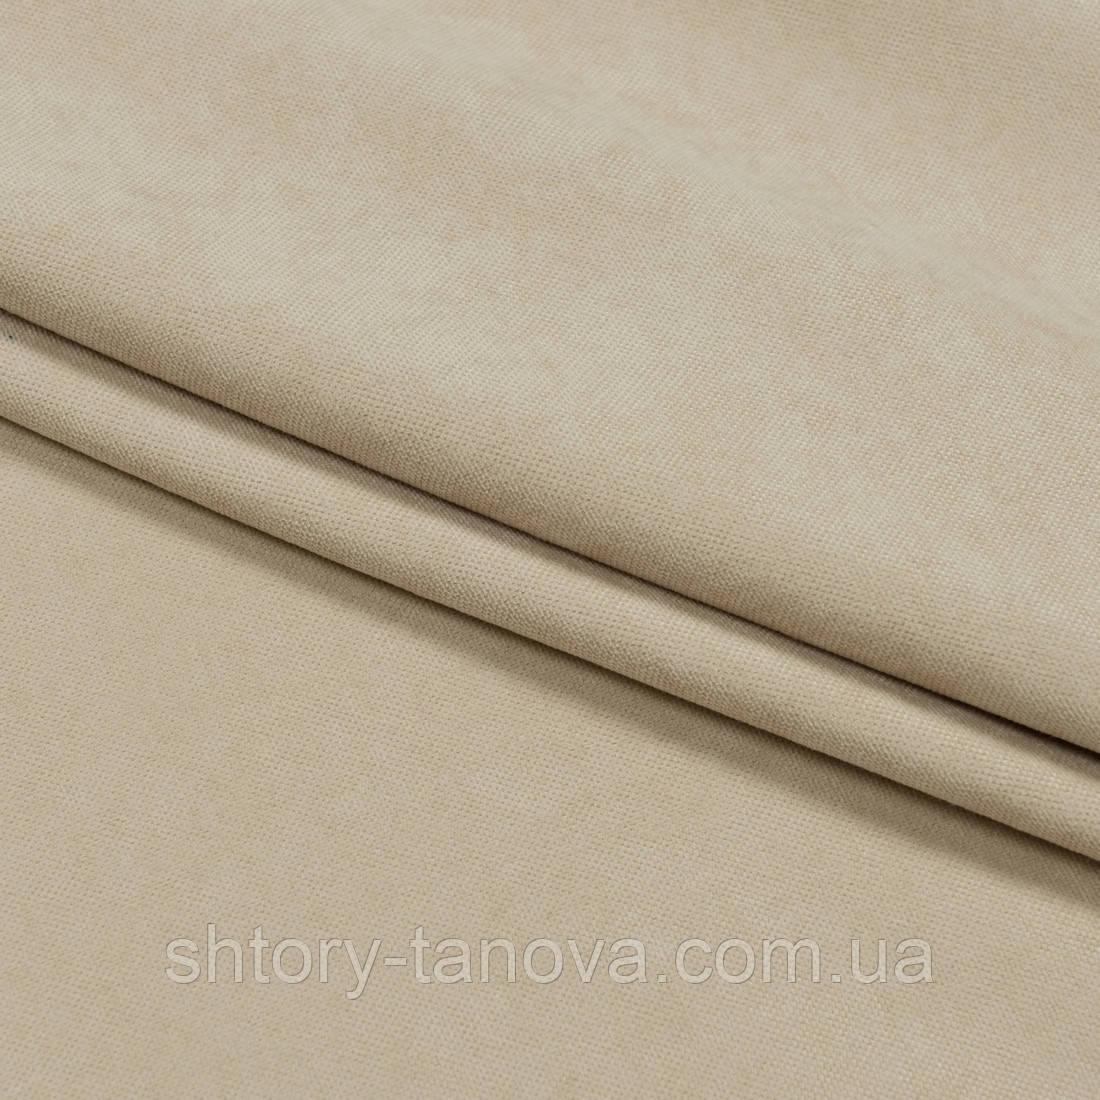 Нубук ткань для штор св.беж